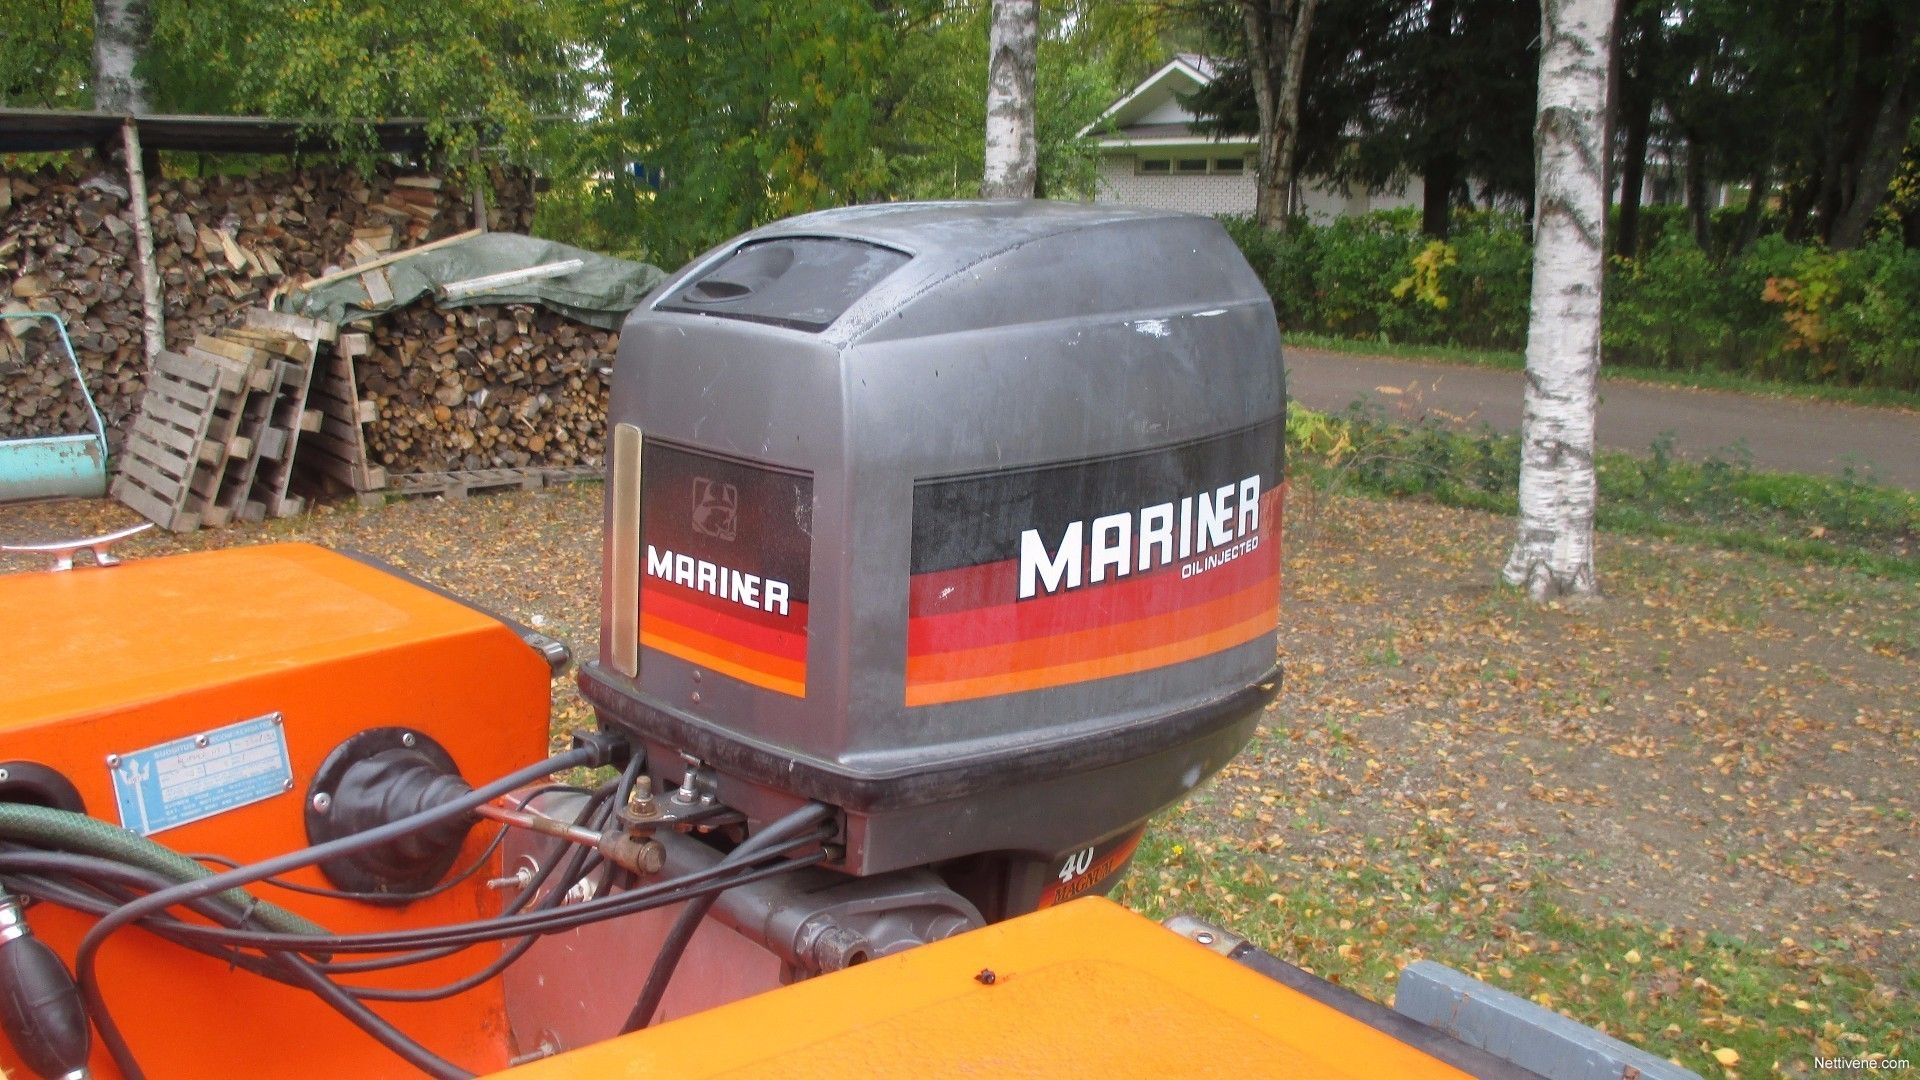 mariner magnum 40 hp service manual